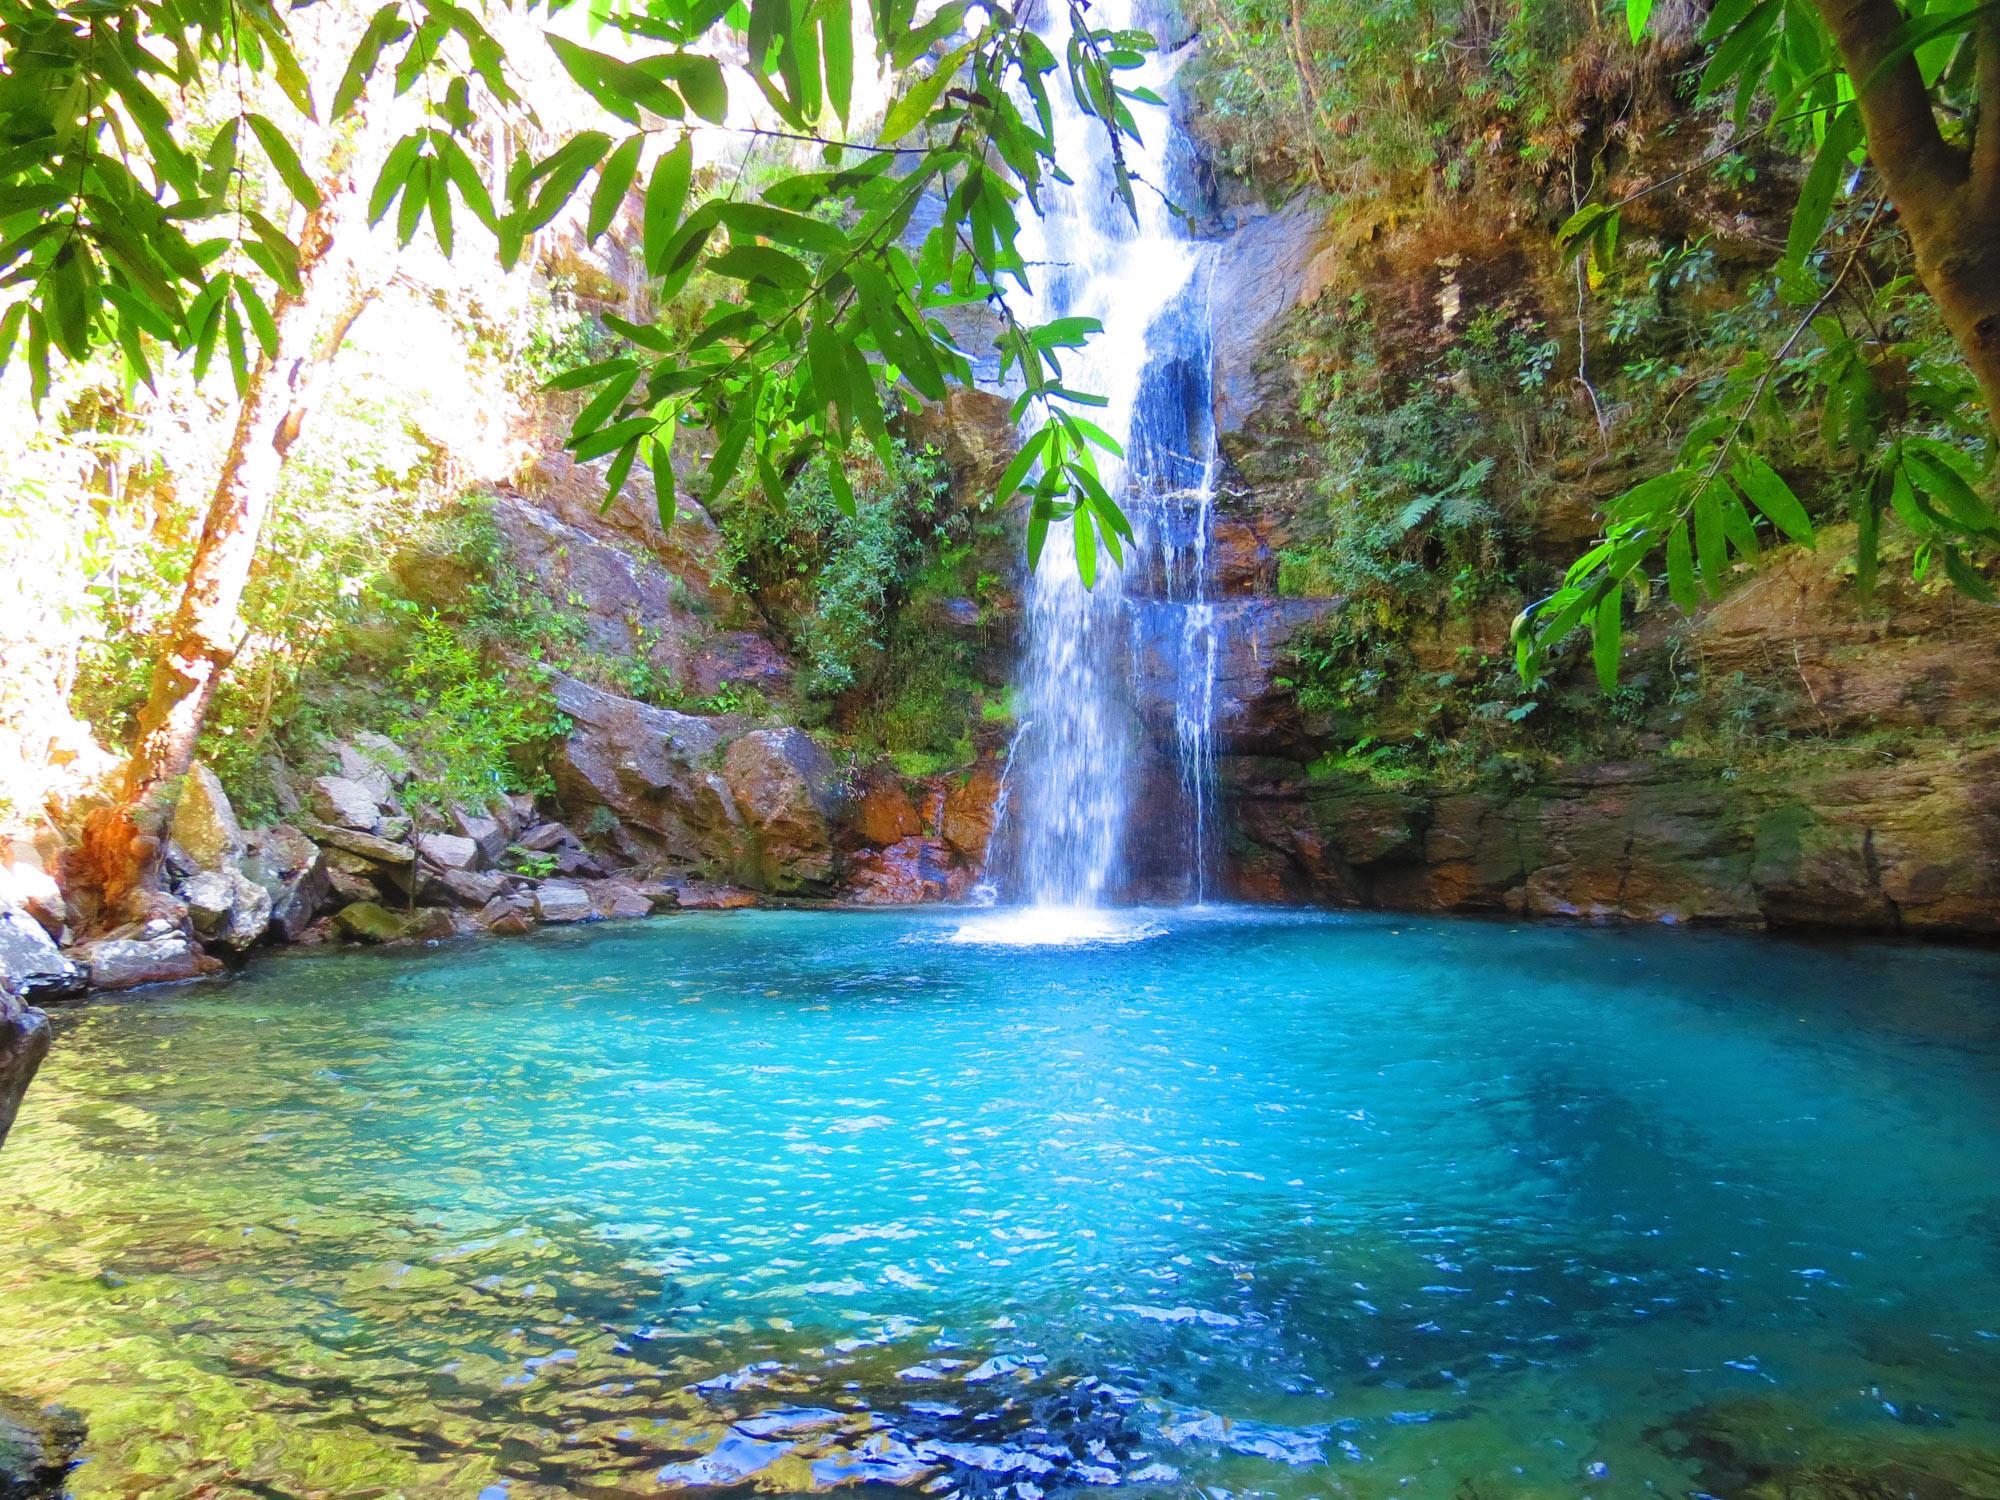 Santuário da cachoeira da Santa Bárbara, Alto Paraíso de Goiás, Chapada dos Veadeiros (GO)